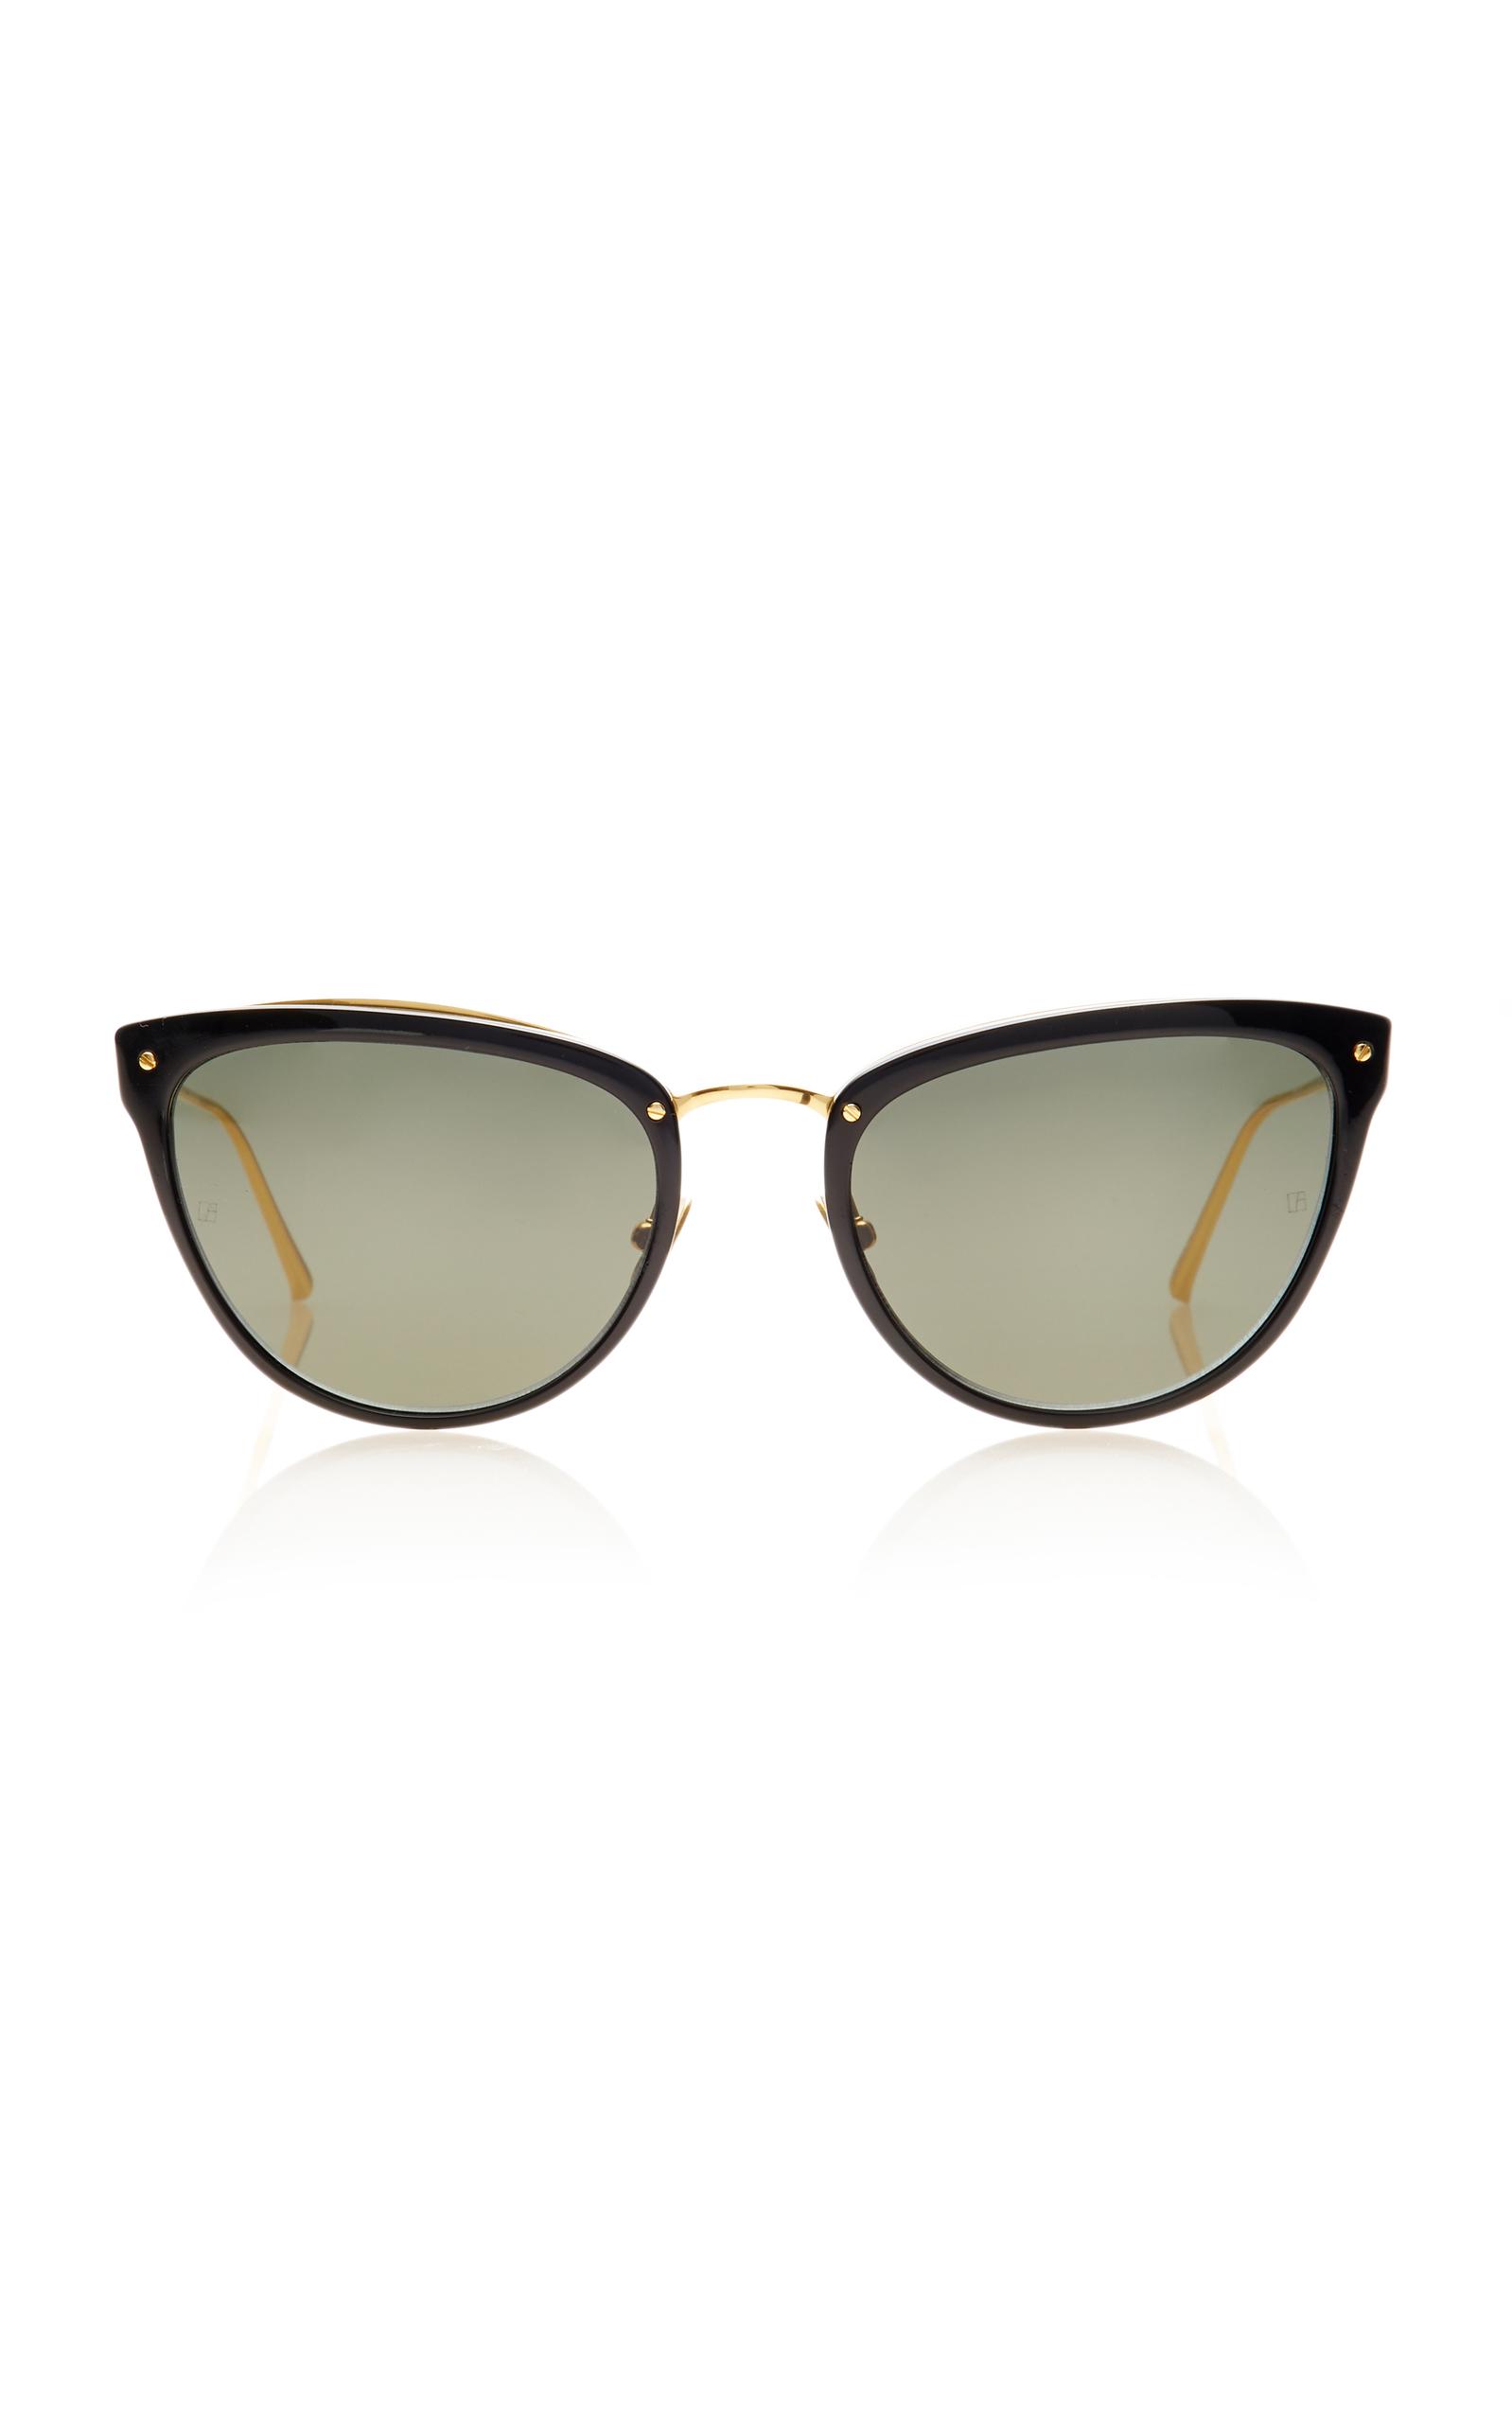 Acetate and Titanium Cat-Eye Sunglasses Linda Farrow h2UnKgFK